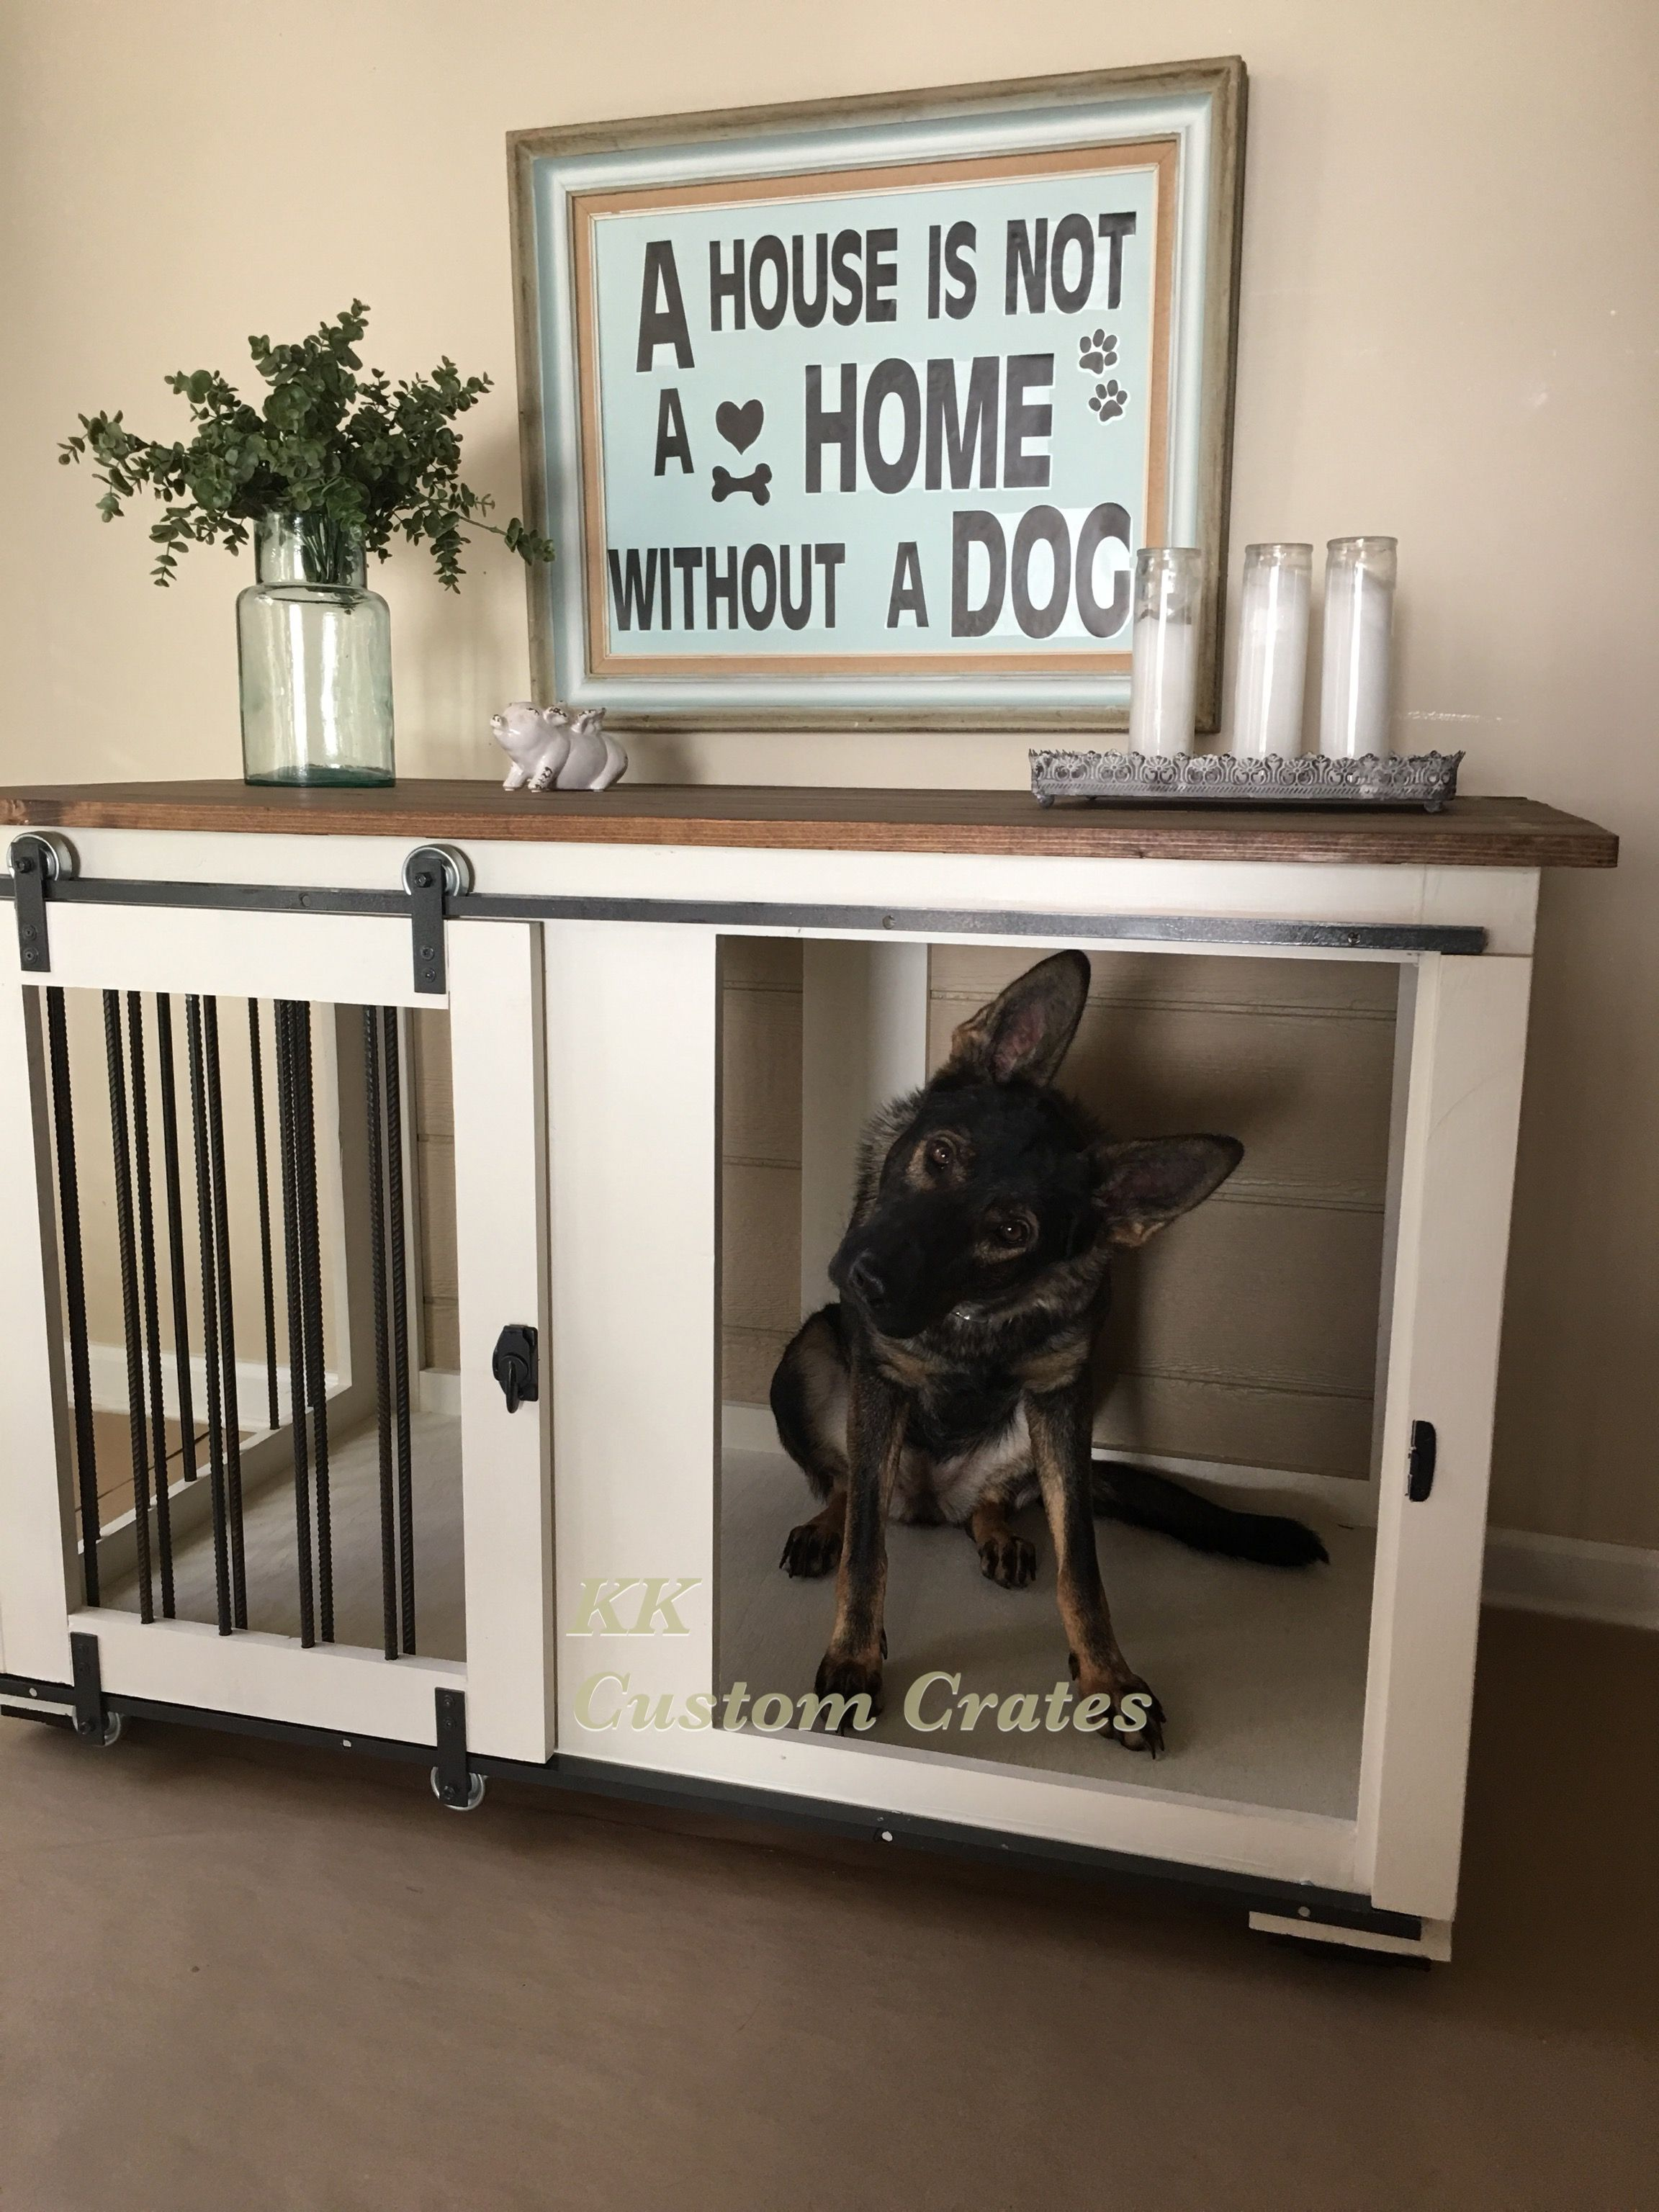 Kk Custom Crates Dogcratefurniture Dog Crate Furniture